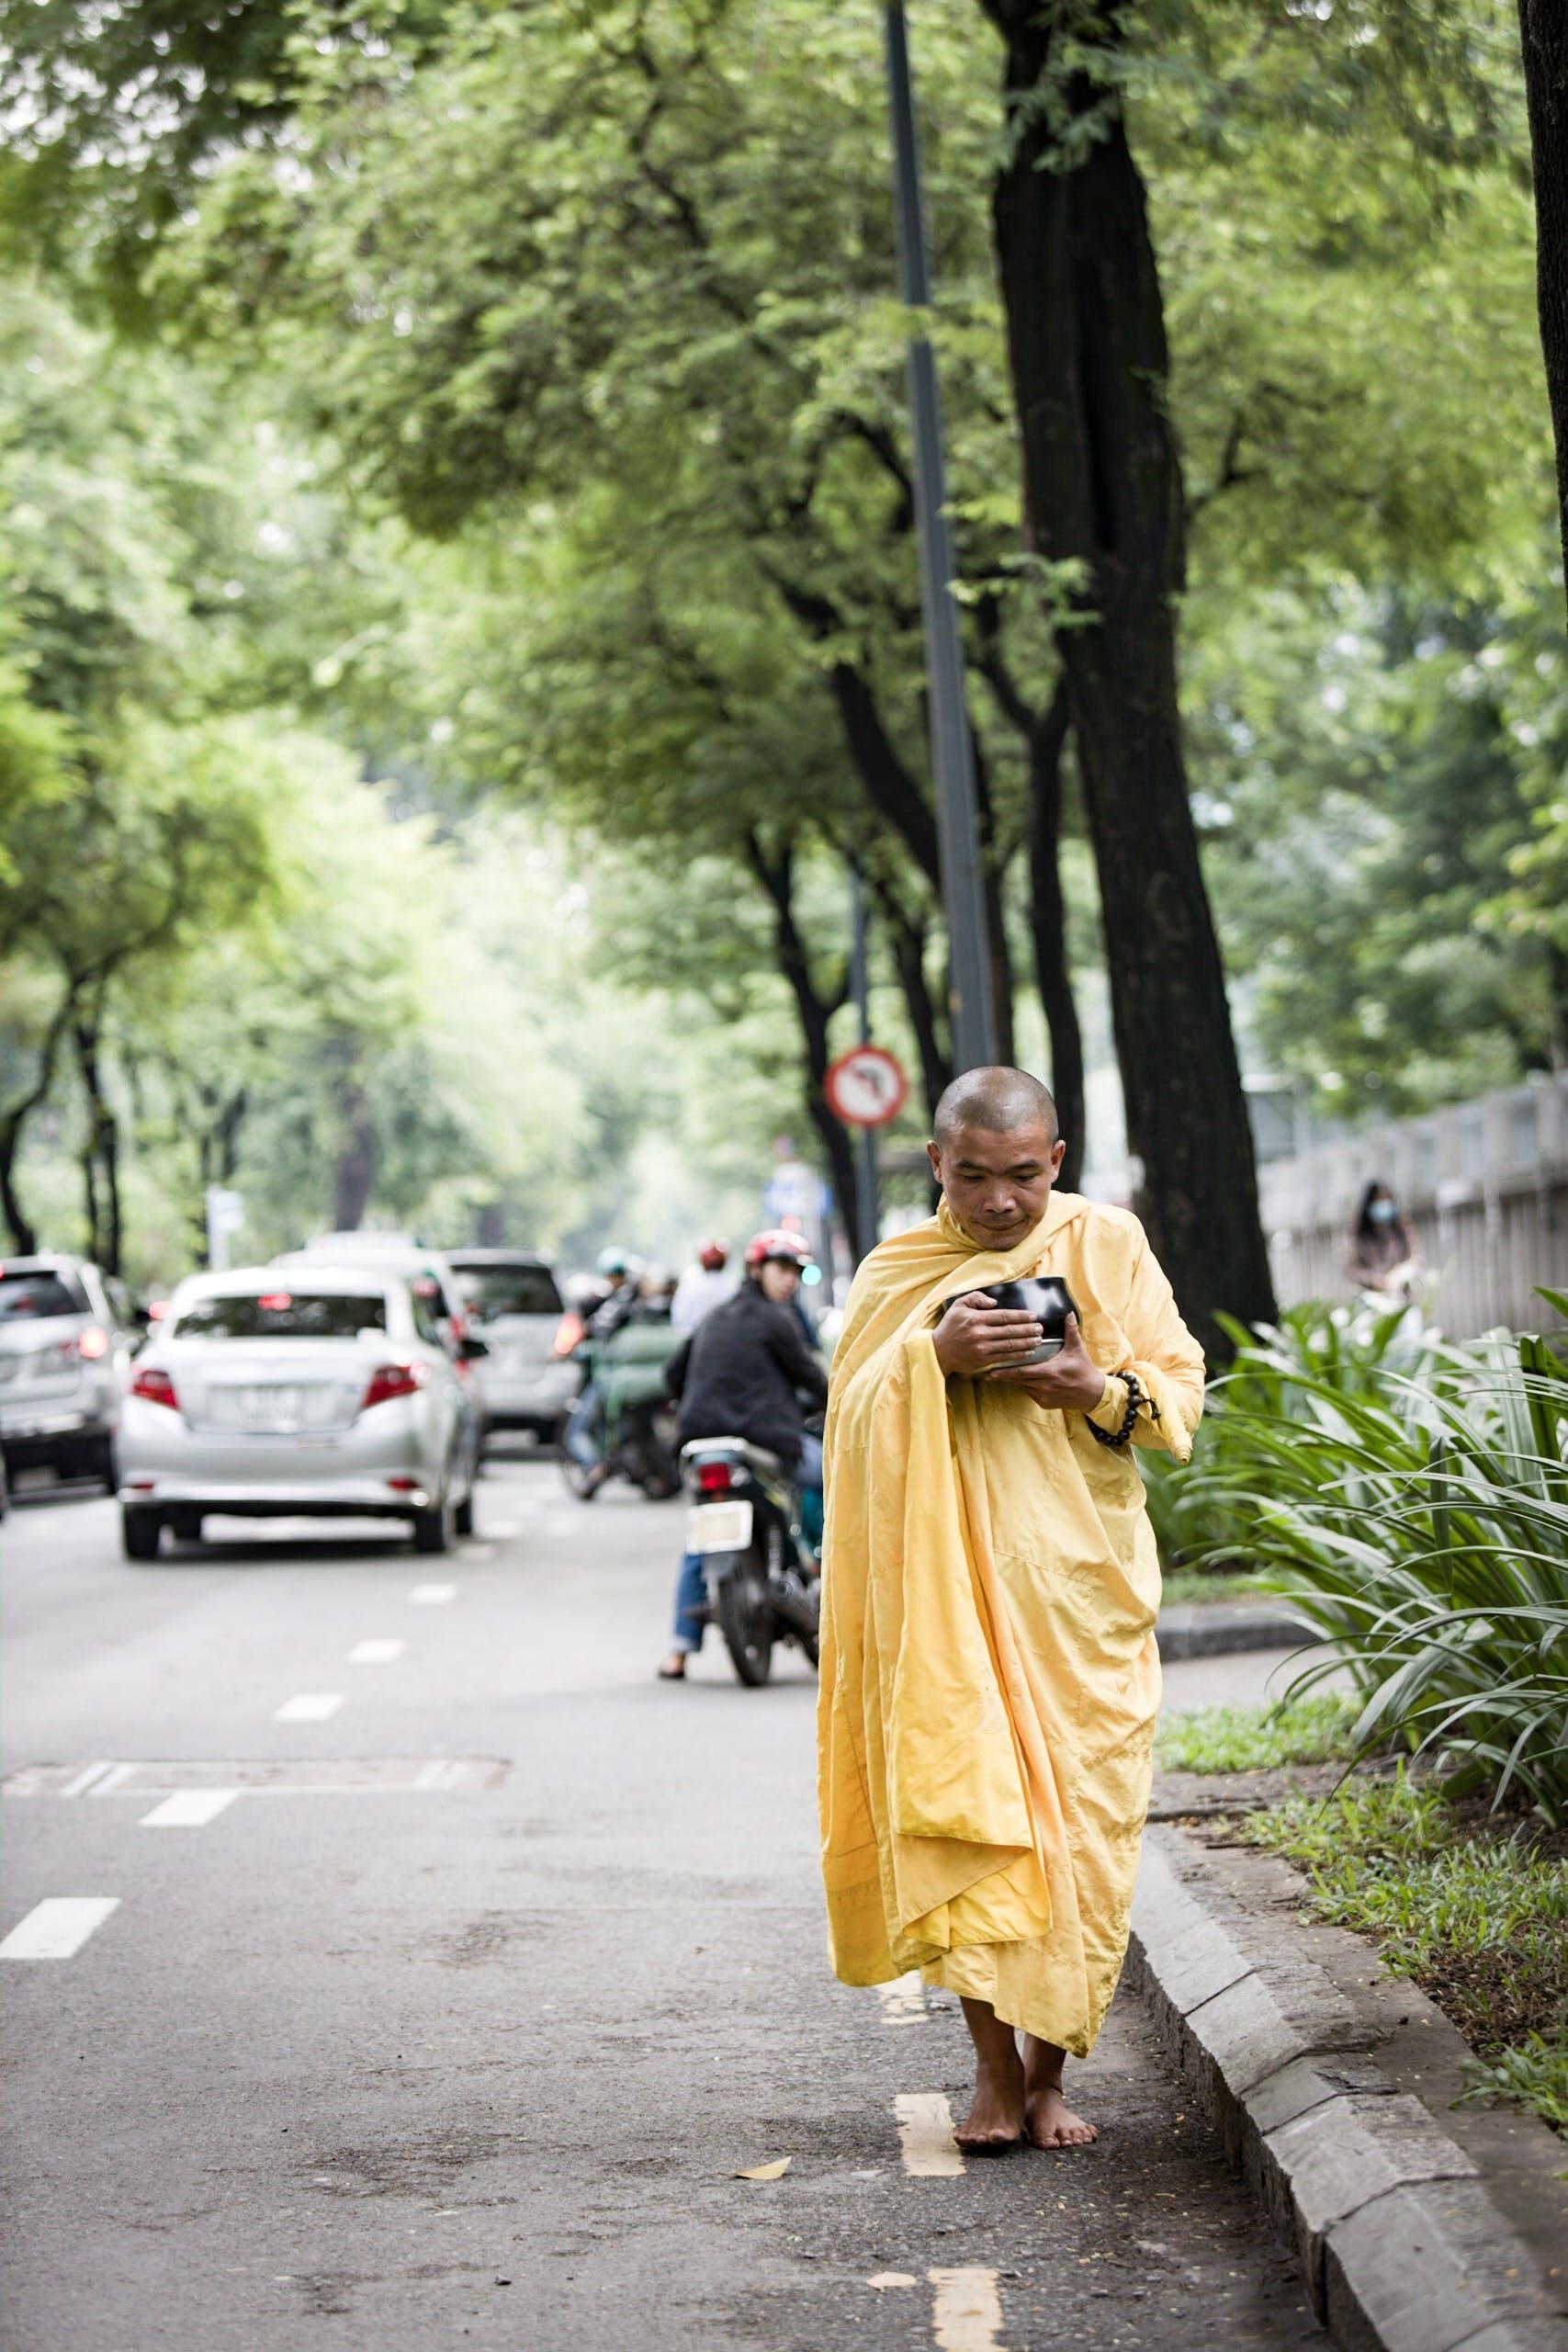 Monk Holding Bowl While Walking on Street